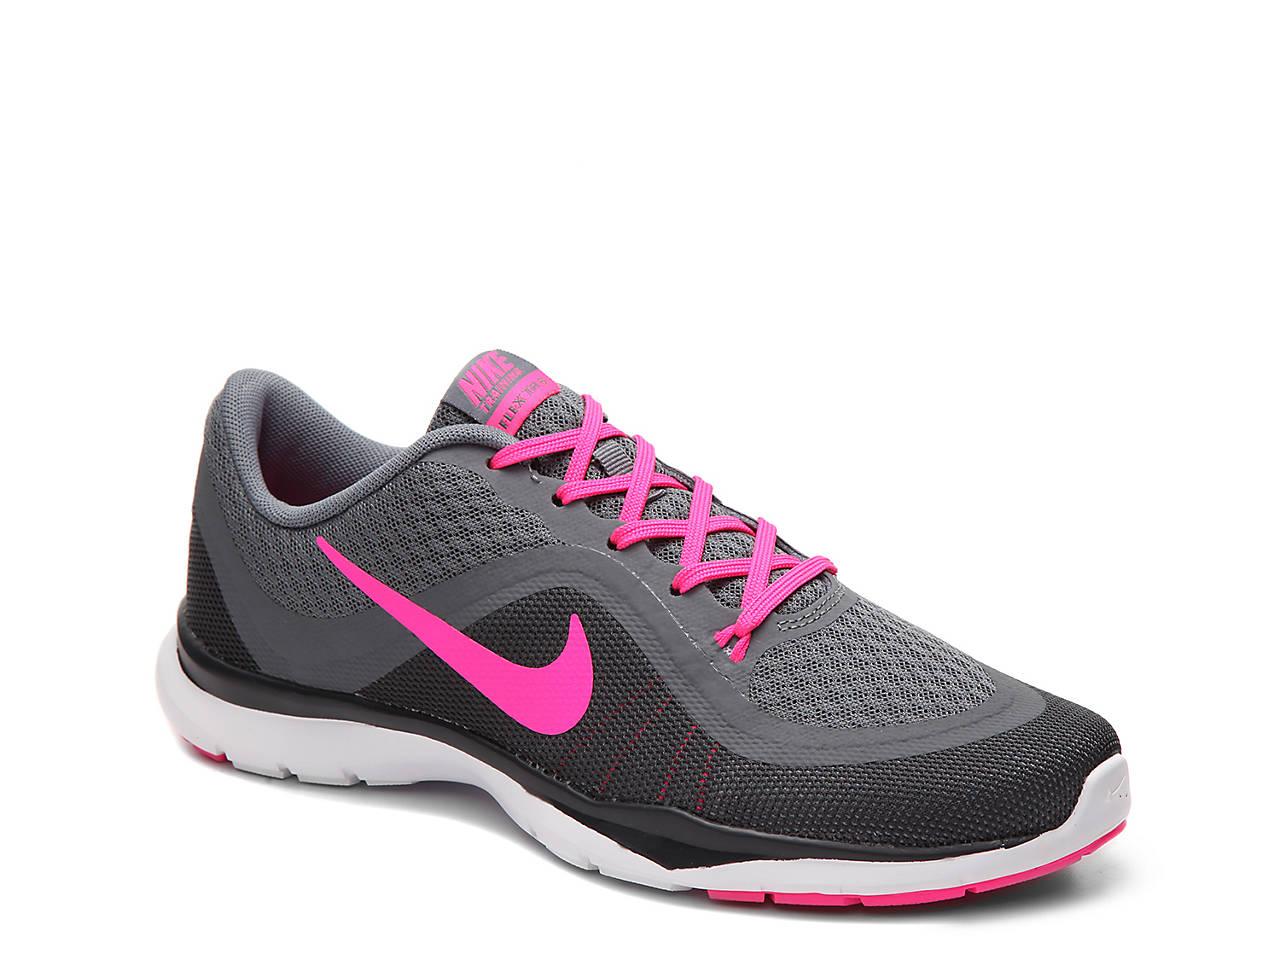 fbb963b49cad5 Nike Flex Trainer 6 Training Shoe - Women s Women s Shoes